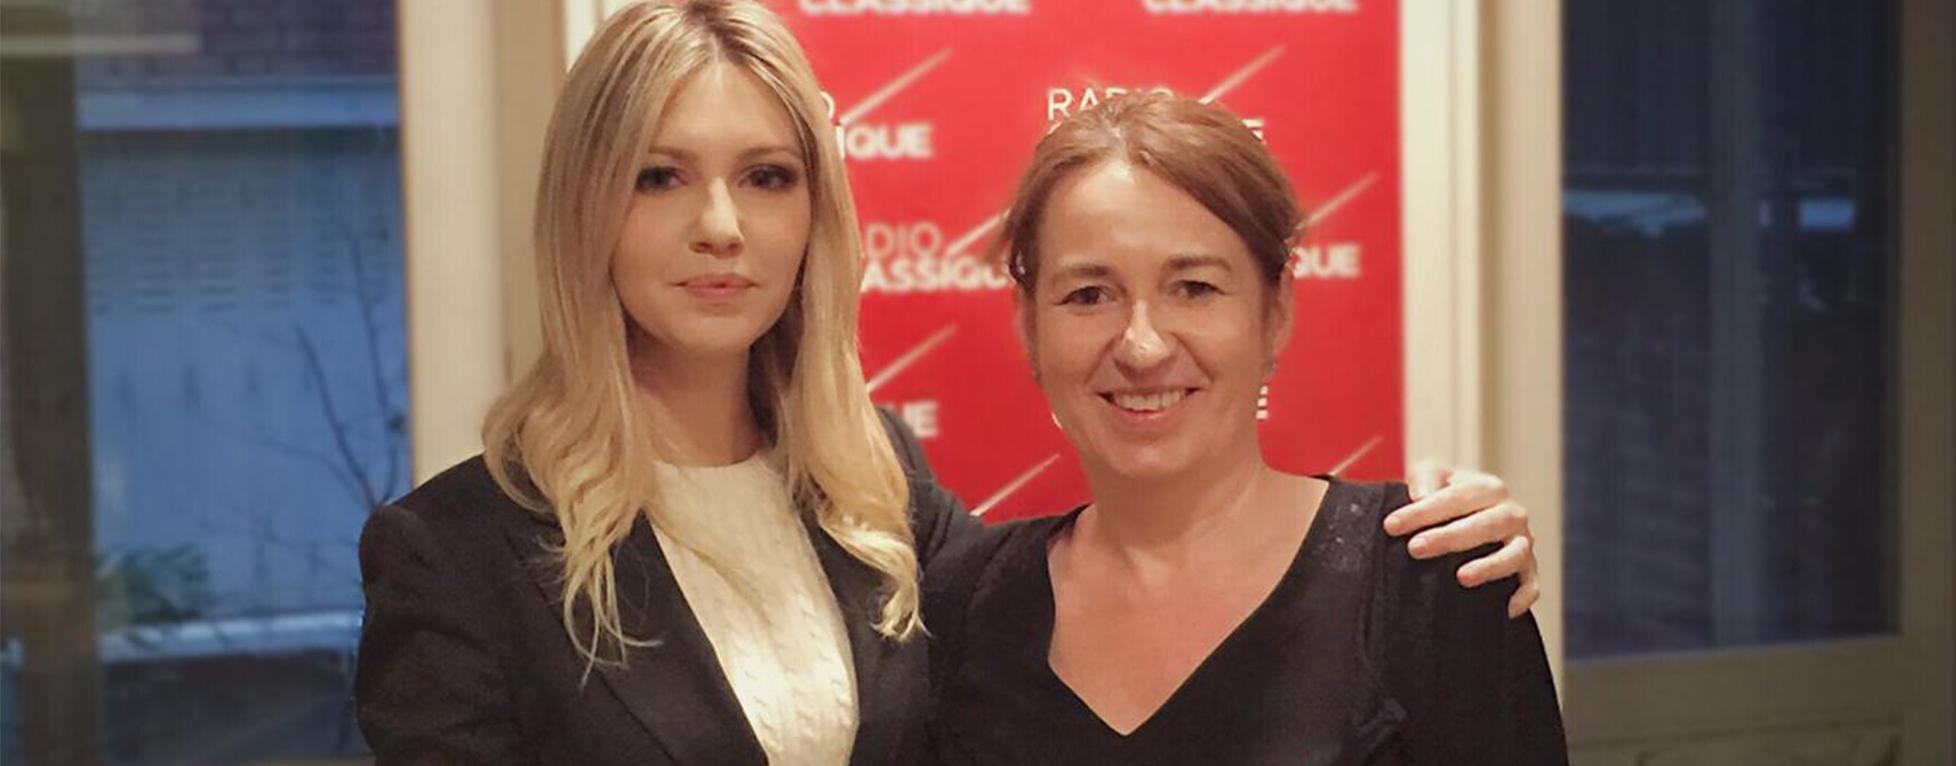 Laure Mézan reçoit la pianiste Vanessa Benelli Mosell